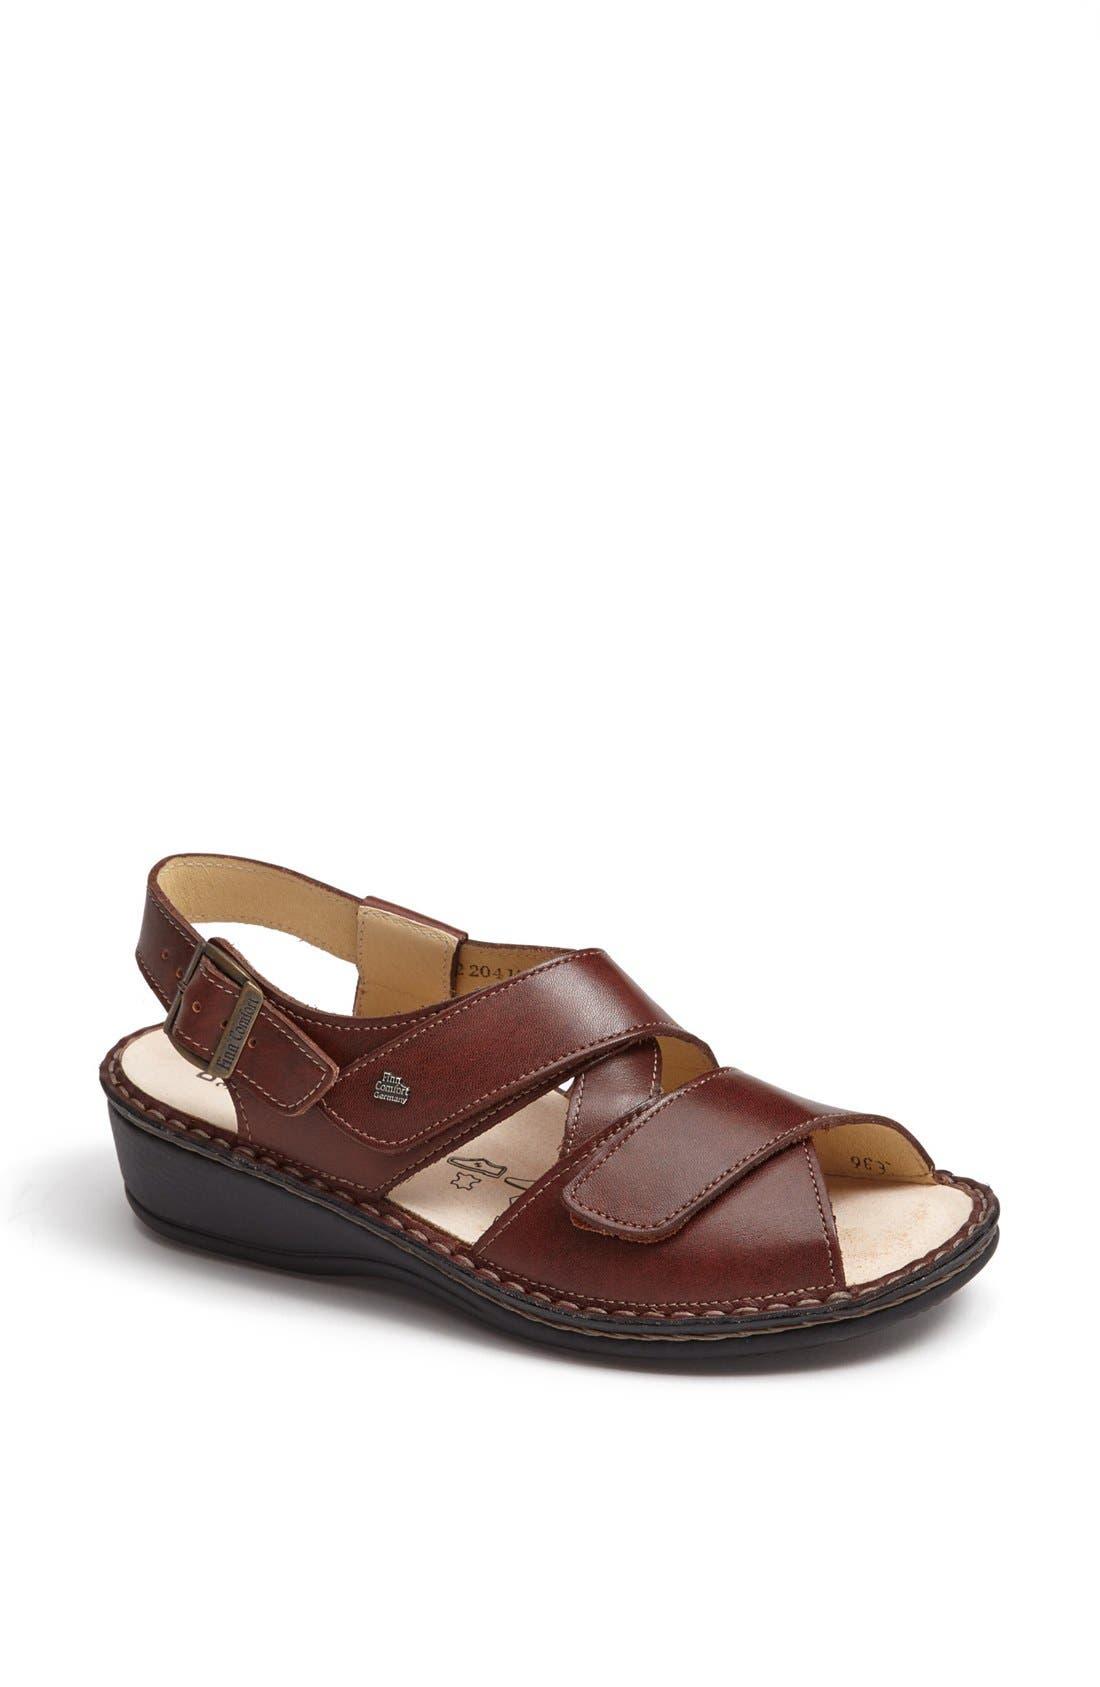 0bada997be1 Women s Finn Comfort Comfortable Shoes